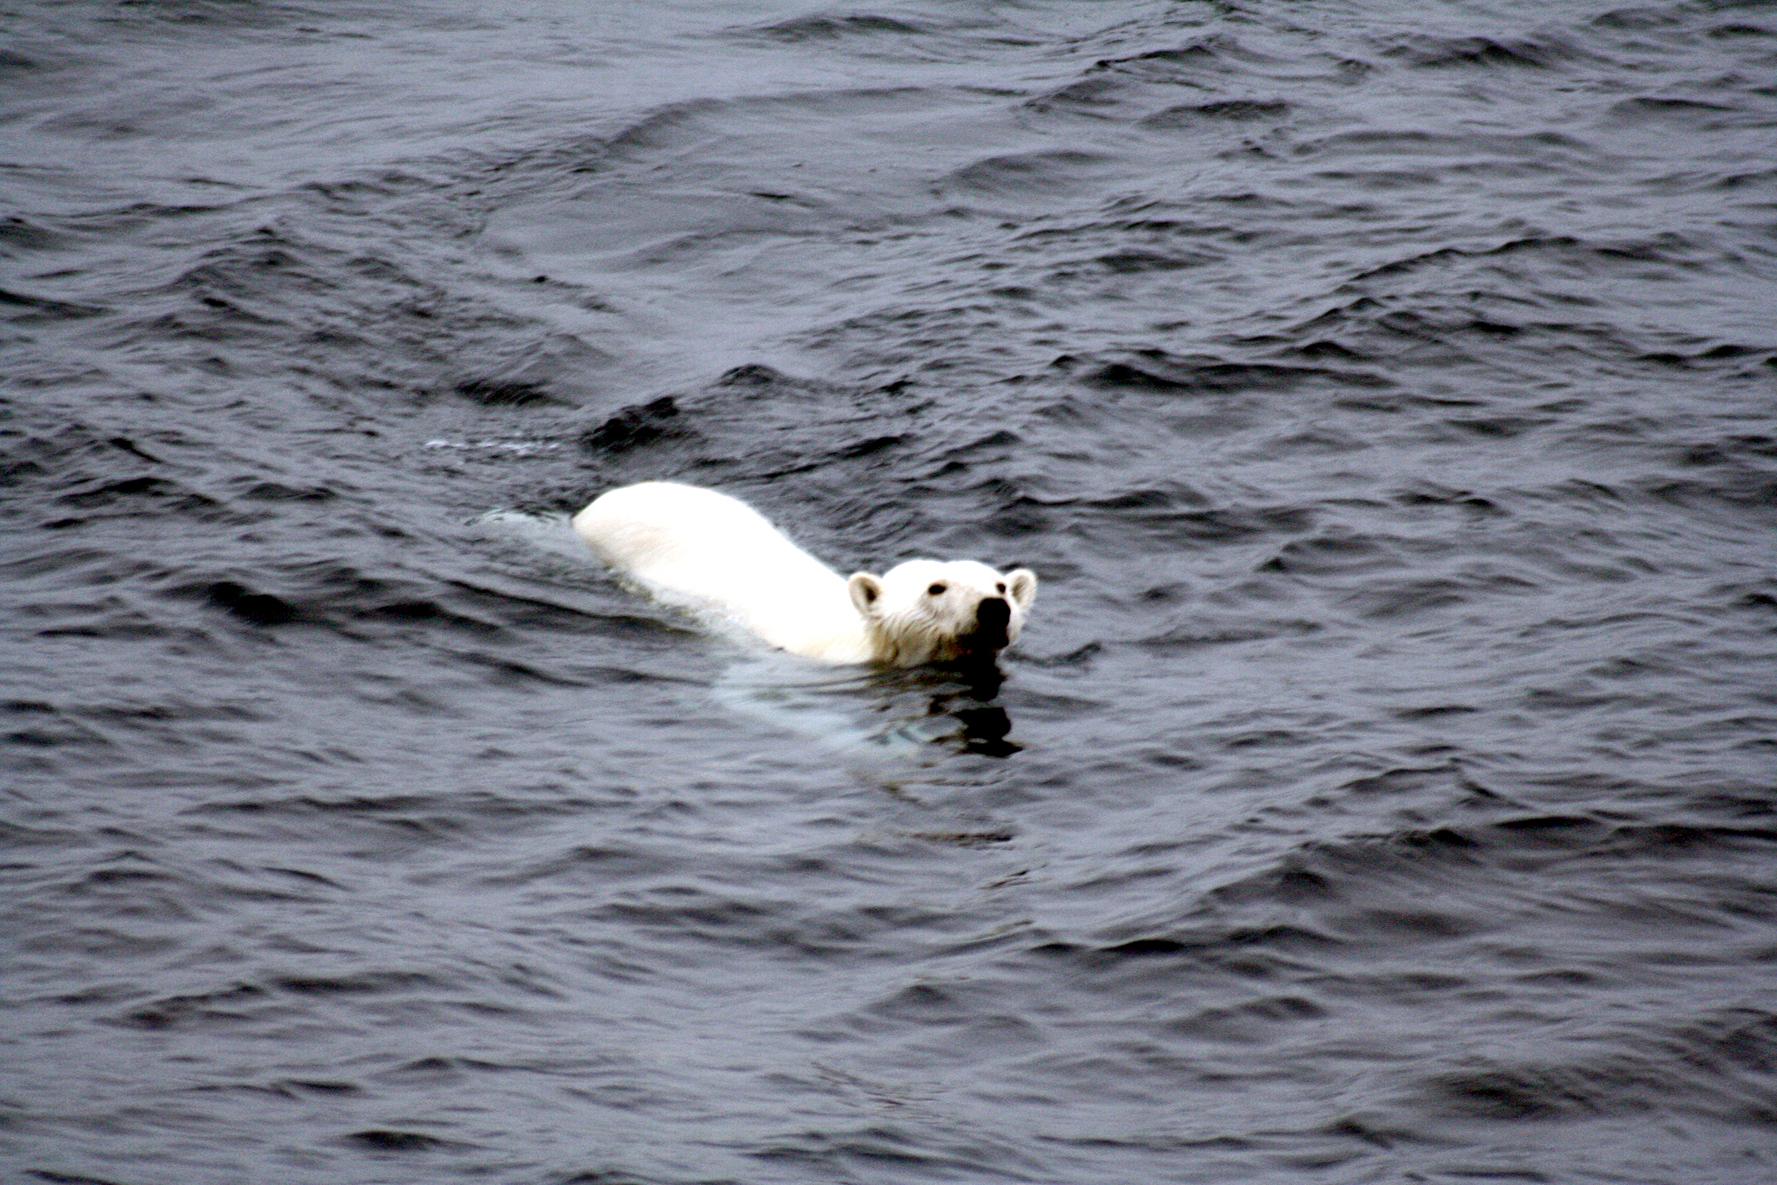 polar bear photo from M. Zinkova